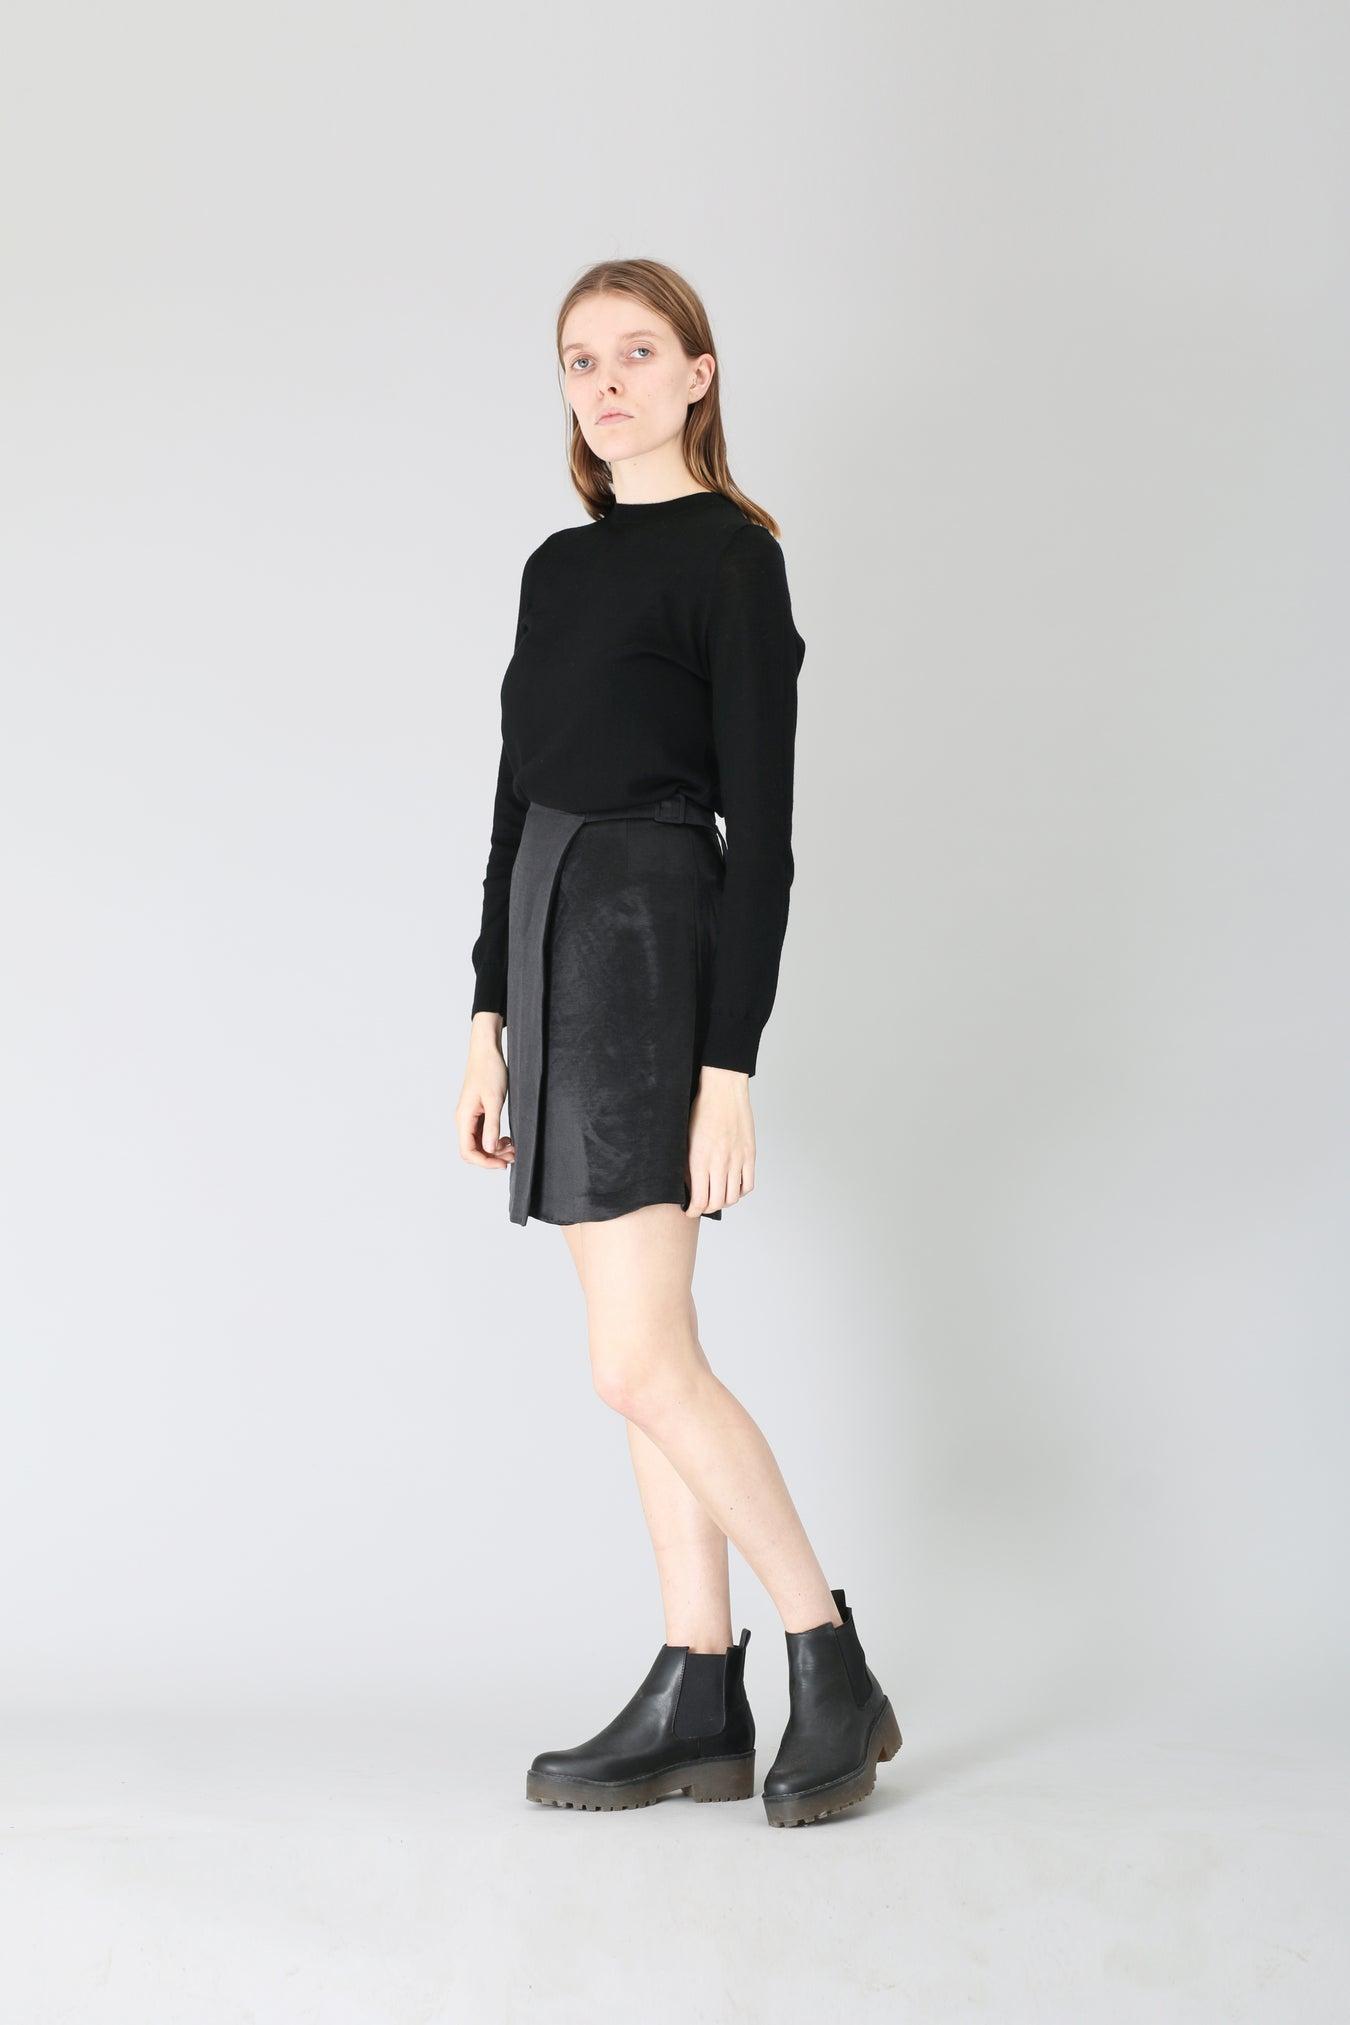 Image of Fuka-Eri skirt